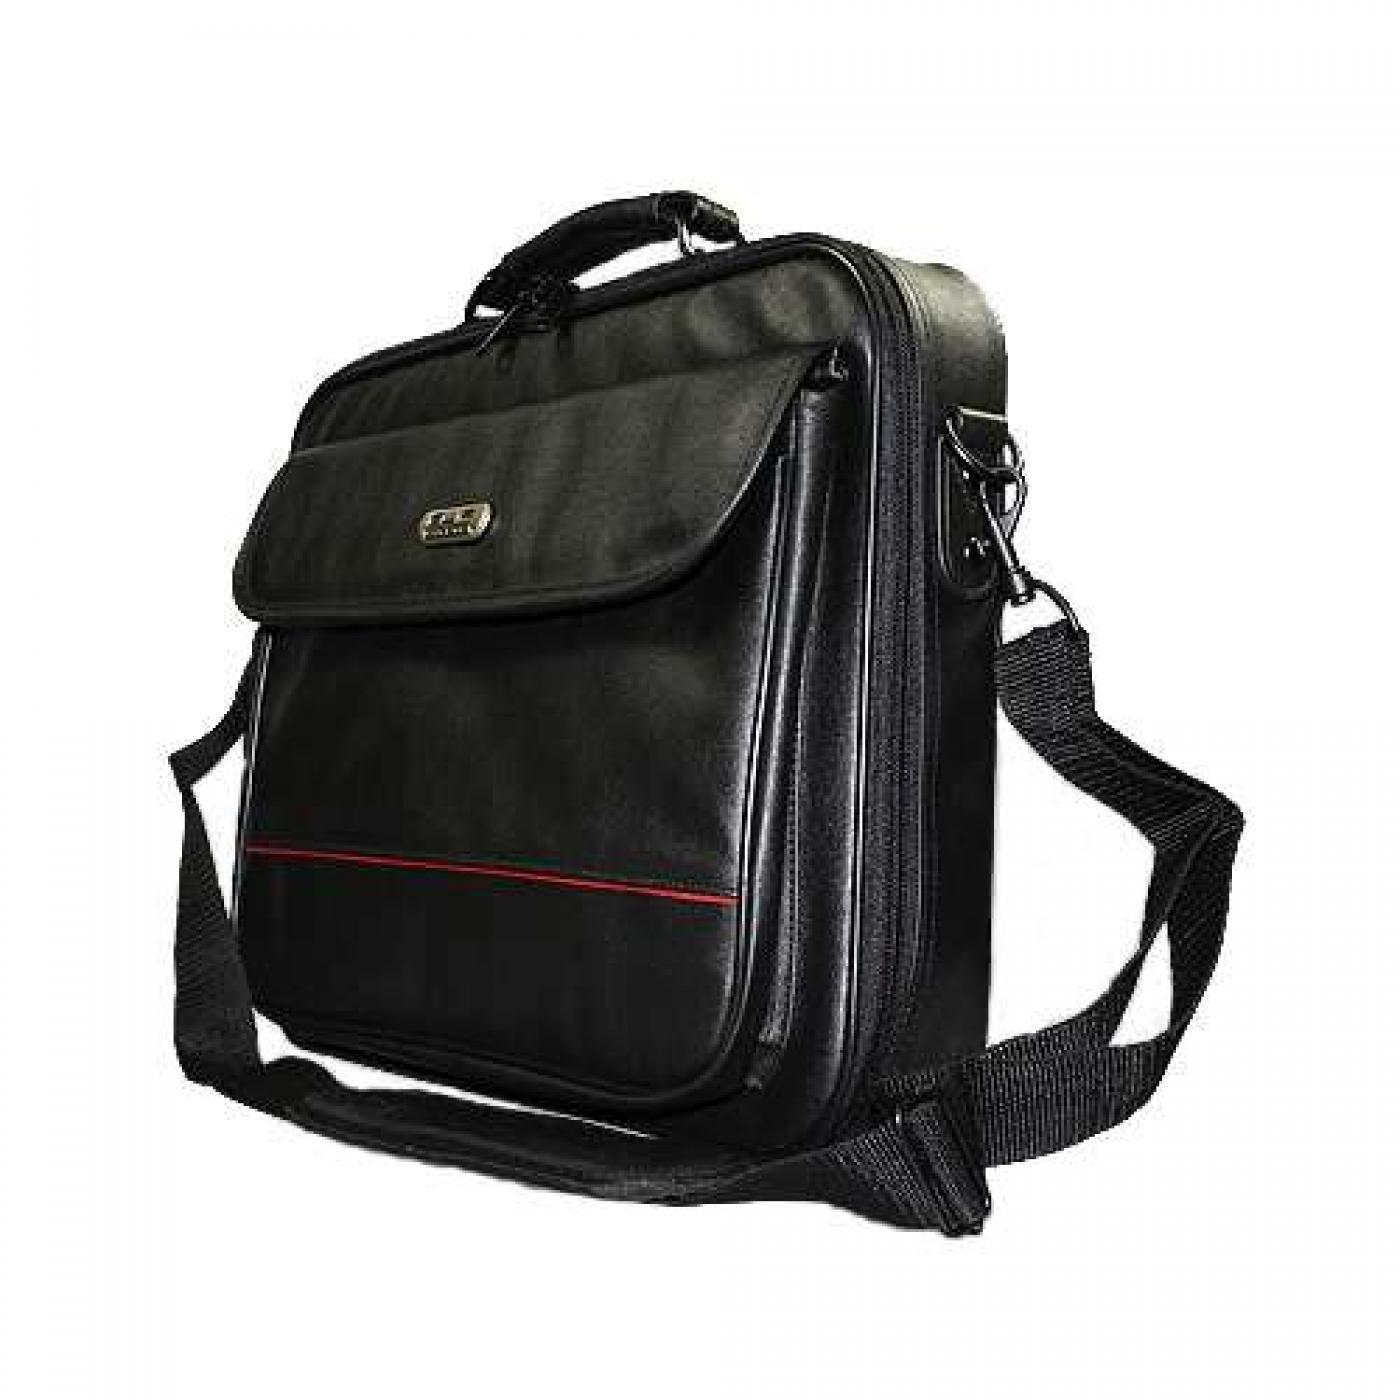 cb4fe2f5d1 Maletín para laptop Klip Xtreme KNC-050 Essential 15.4